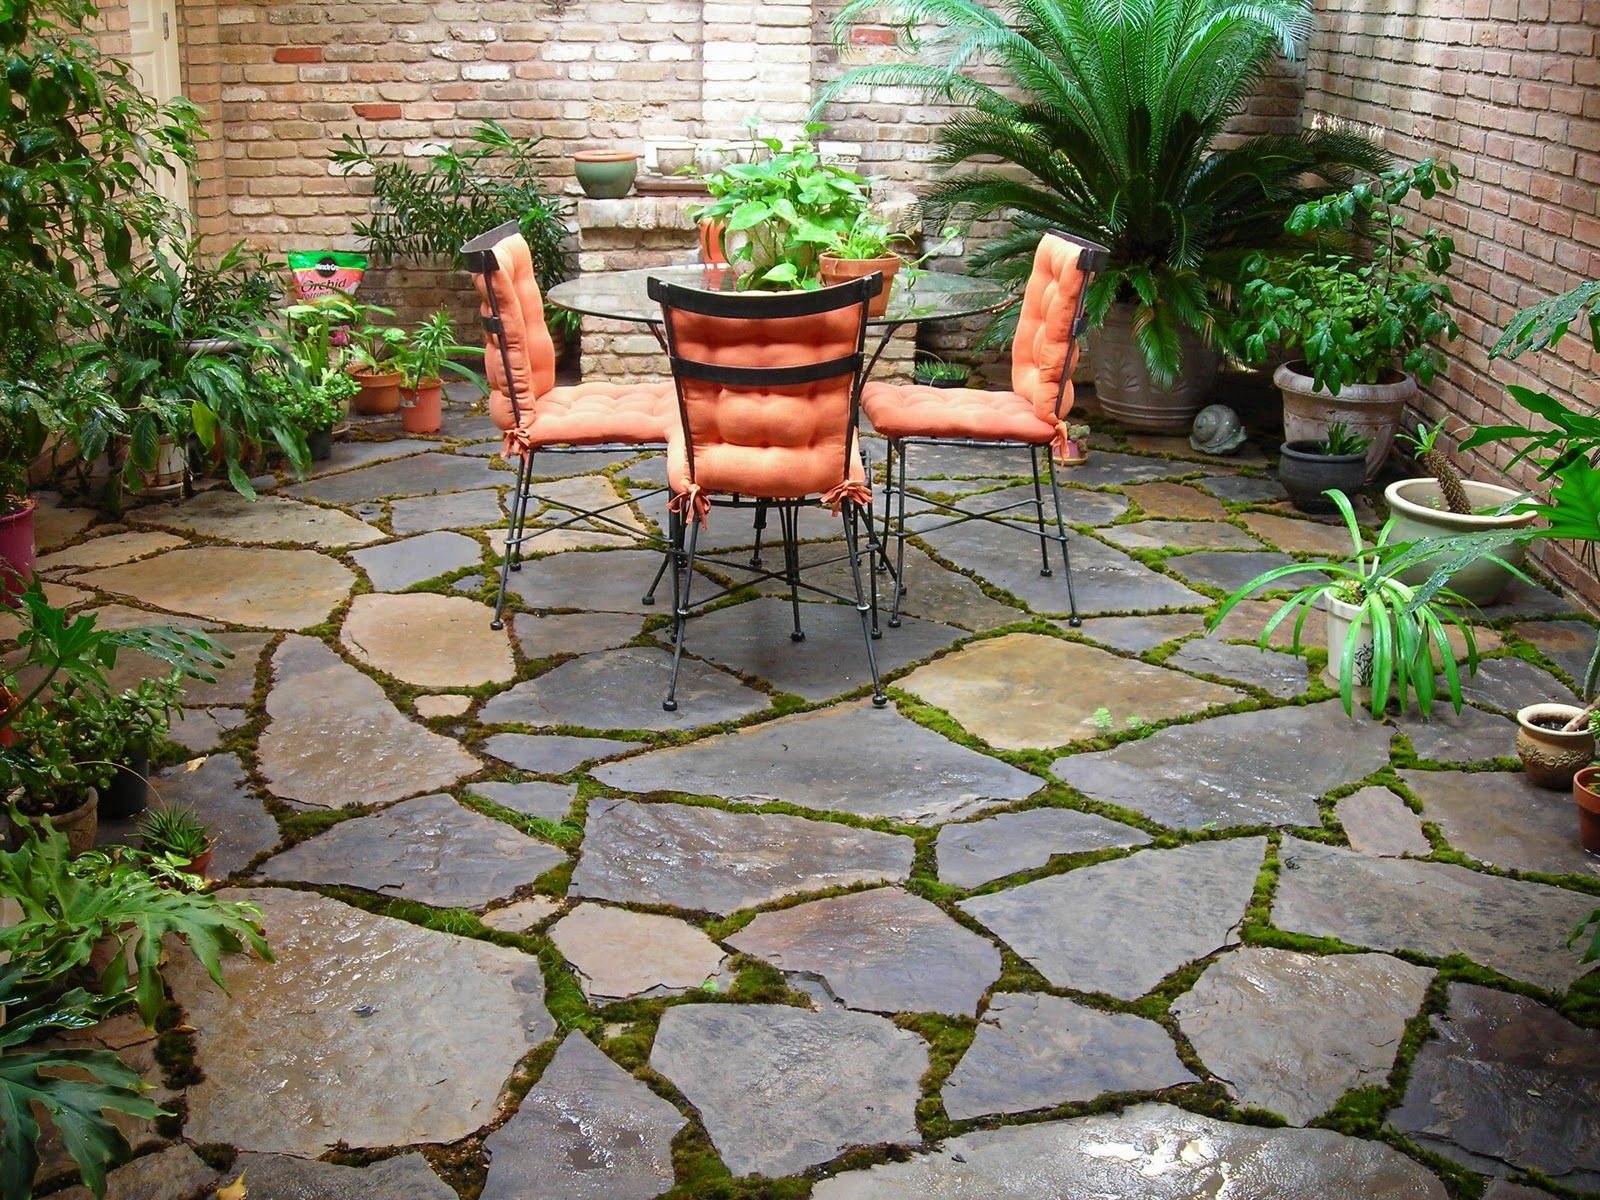 25 Best Ideas About Paving Stones On Pinterest Paving Stone